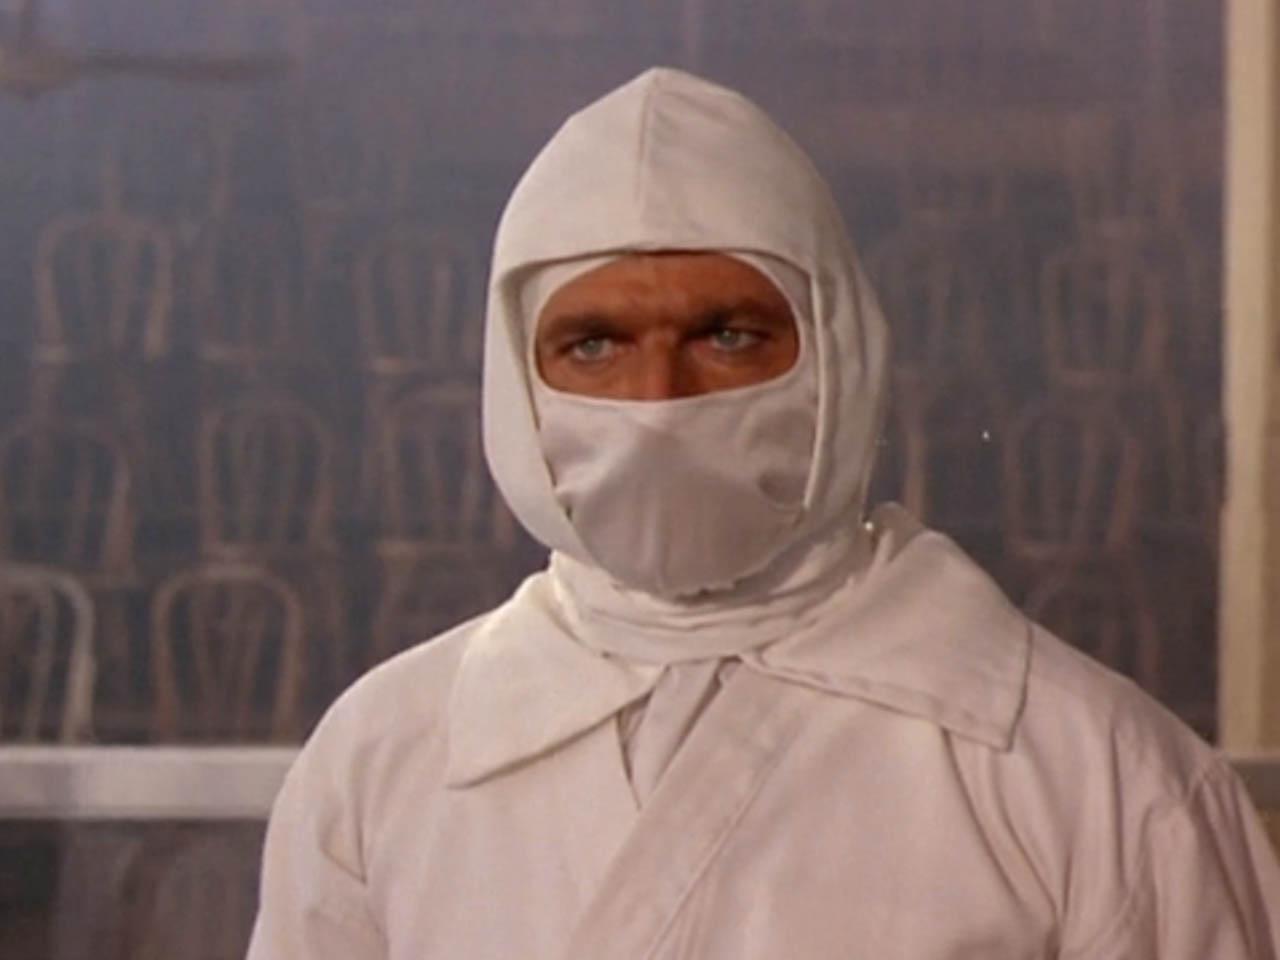 1981 Movie Project - Enter the Ninja - 01